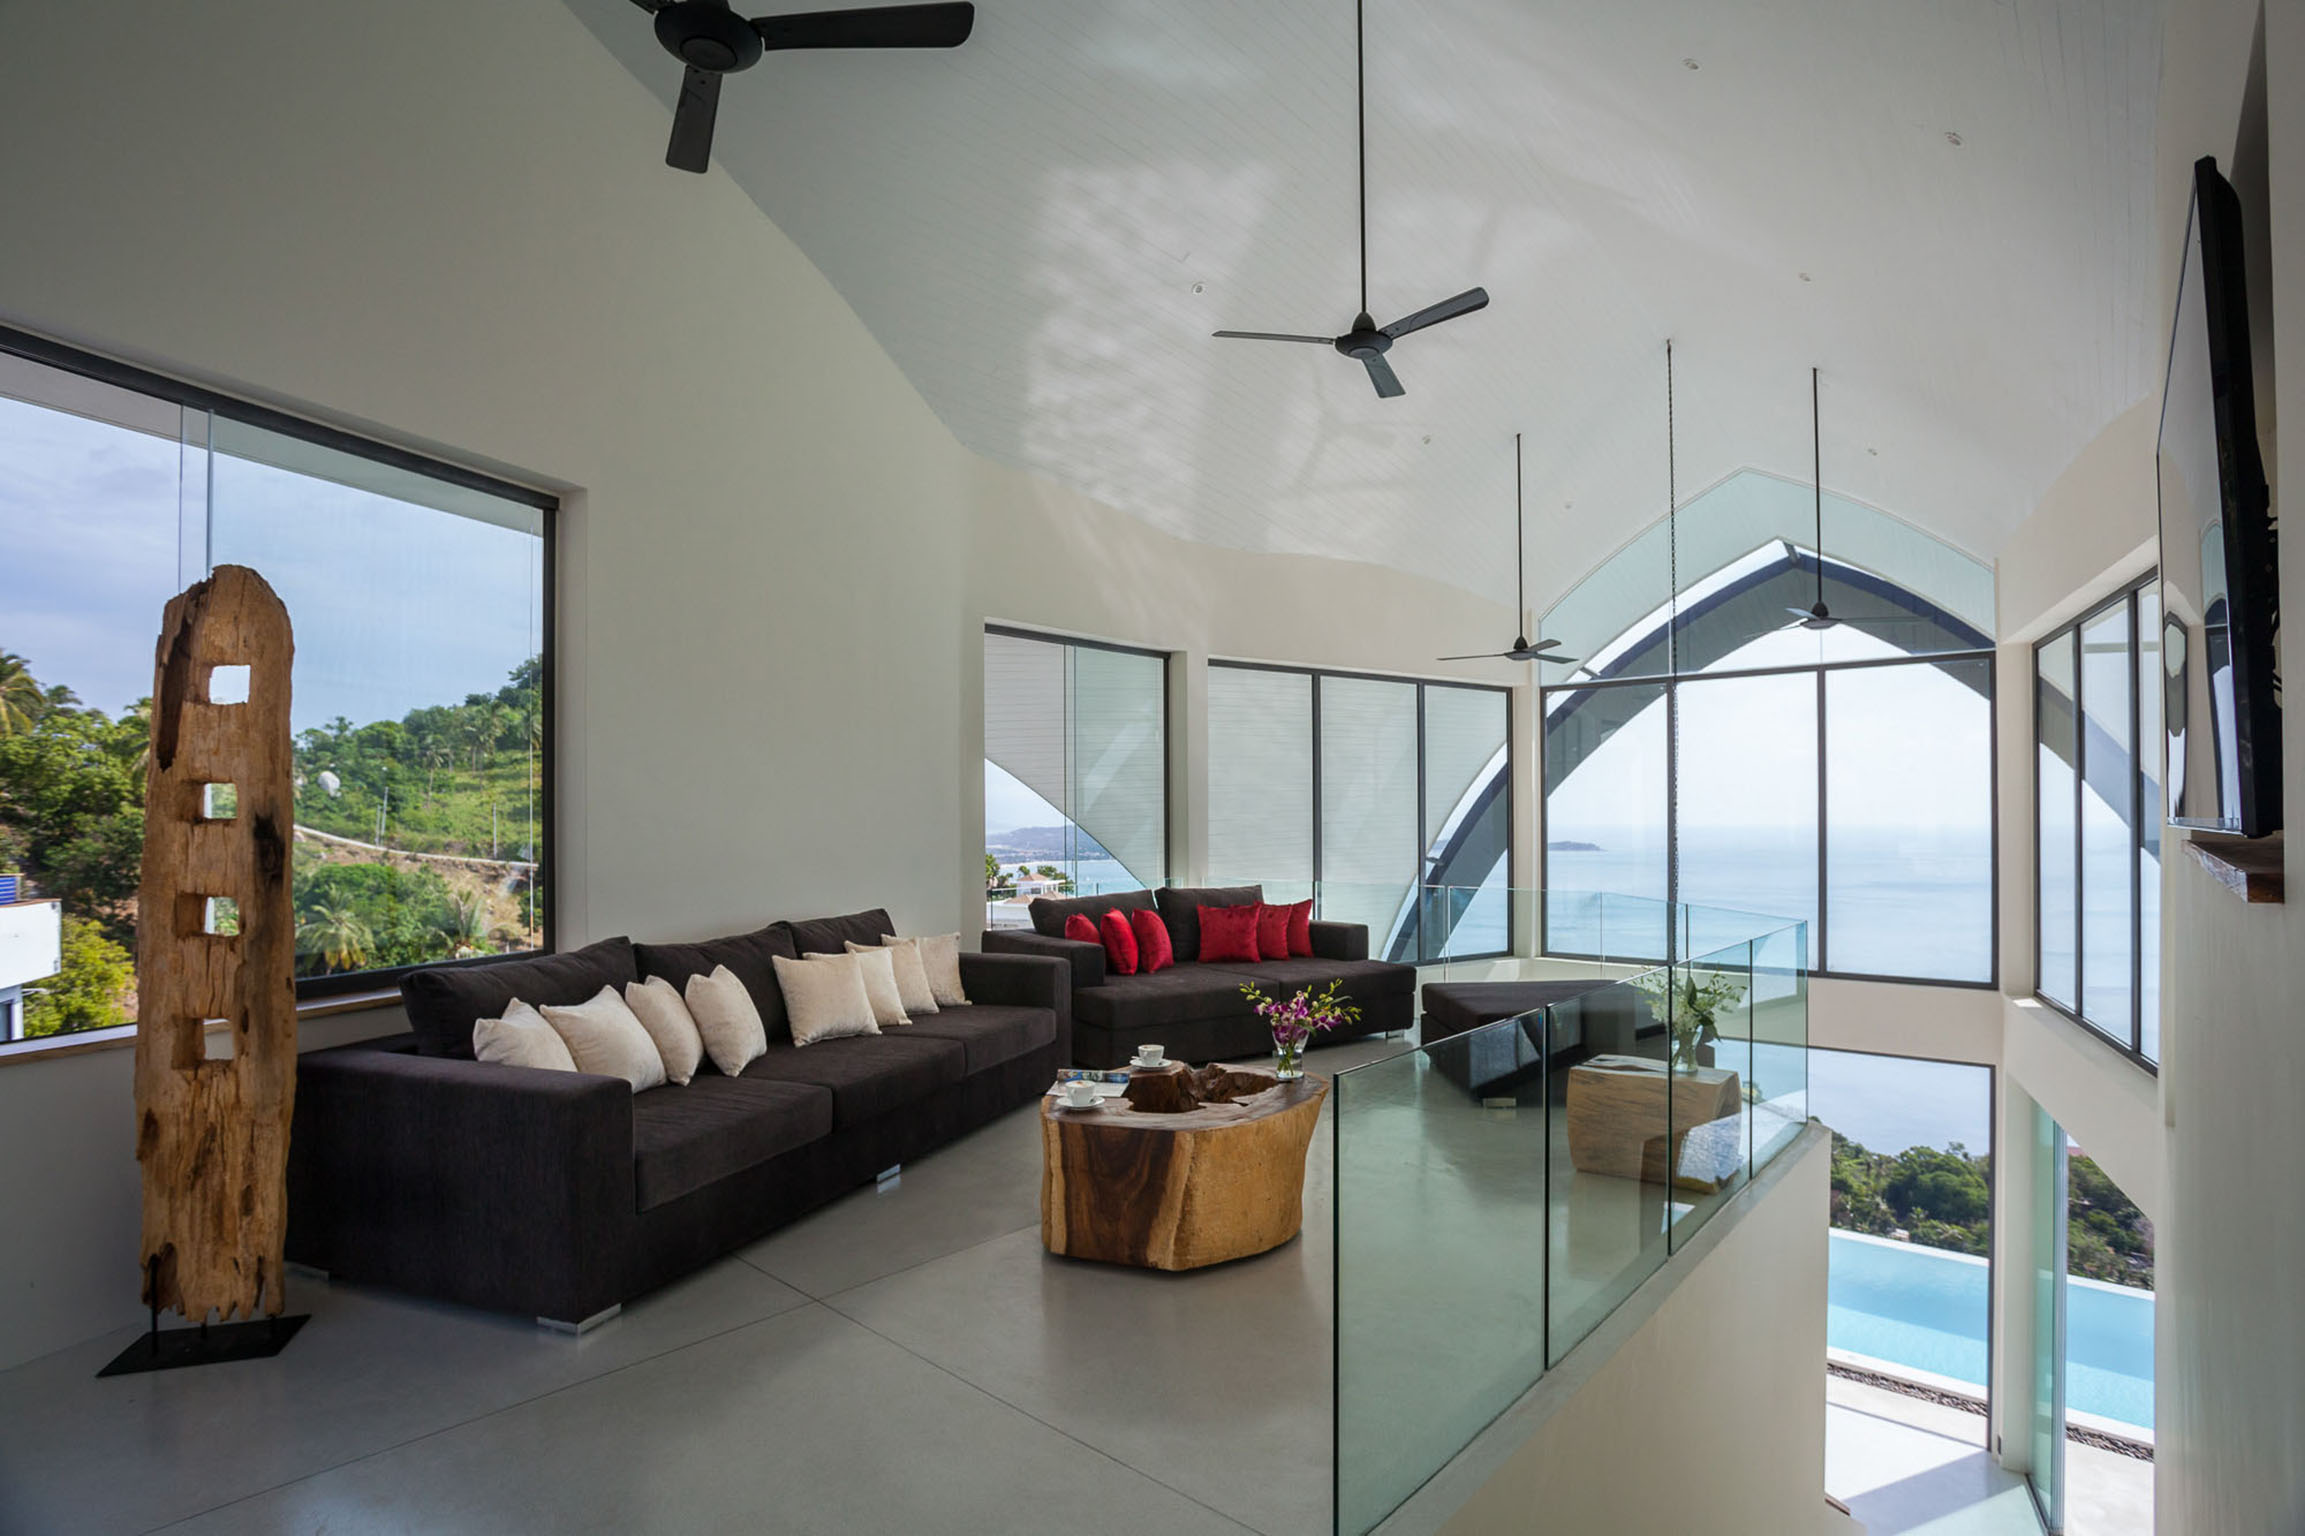 Relaxing area with flatscreen TV